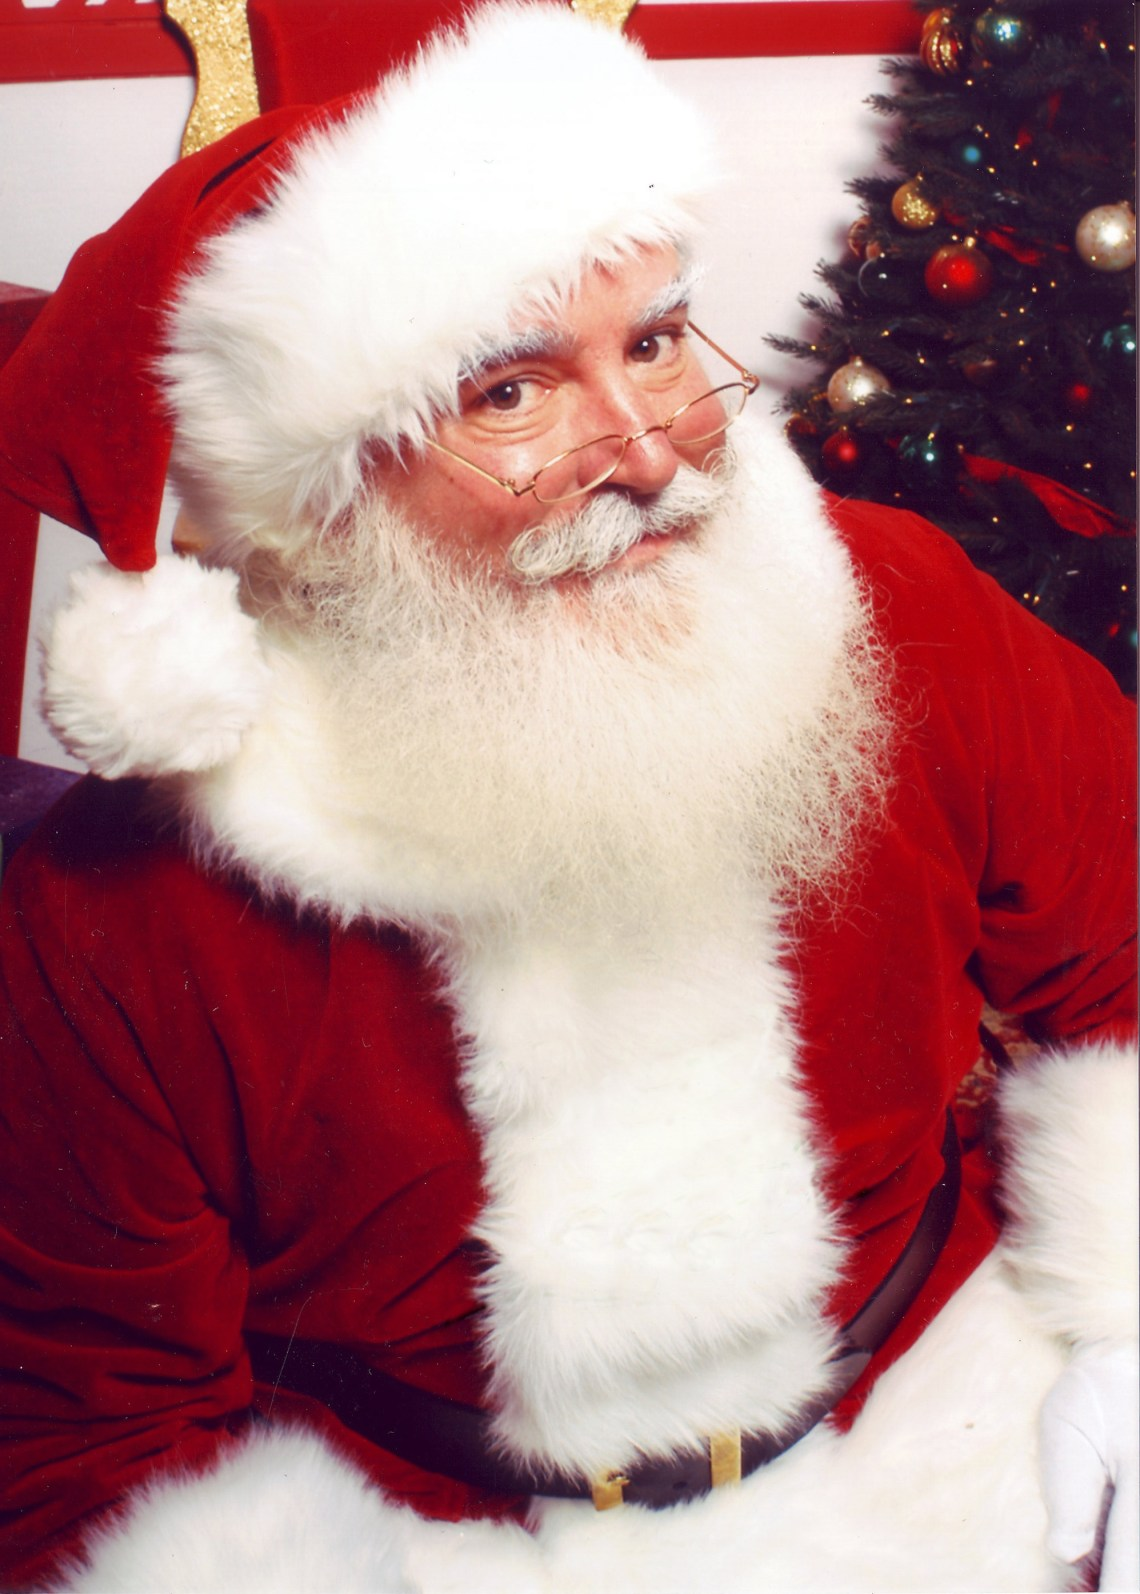 Jonathan G Meath portrays Santa Claus Dog Clothes For Pitbulls